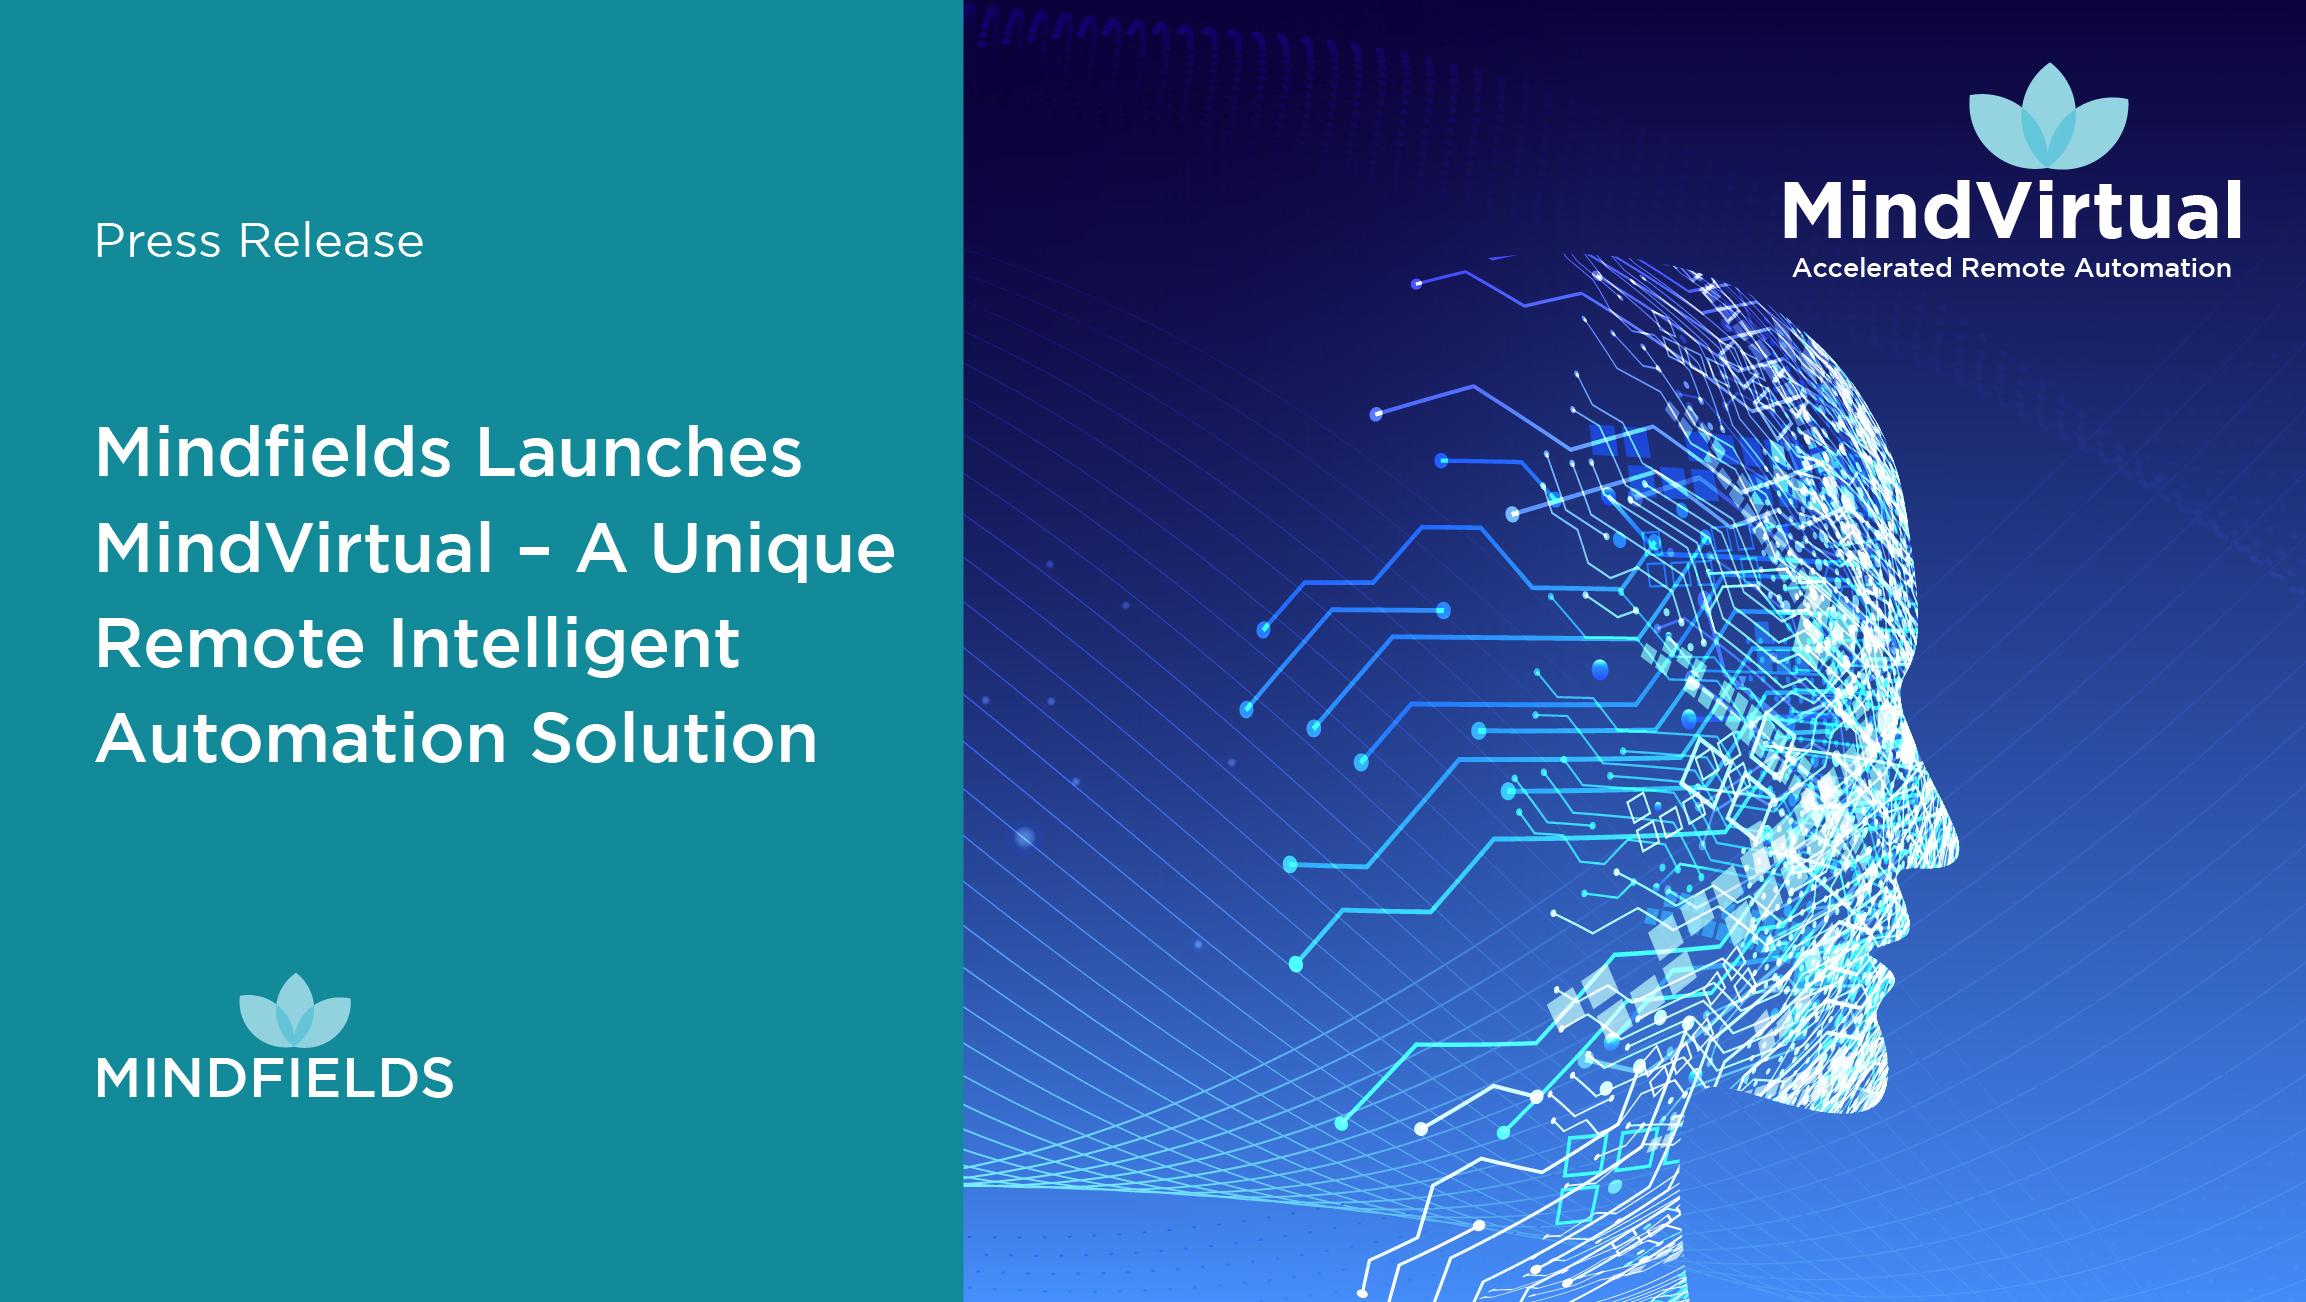 Mindfields Launches MindVirtual – A Unique Remote Intelligent Automation Solution